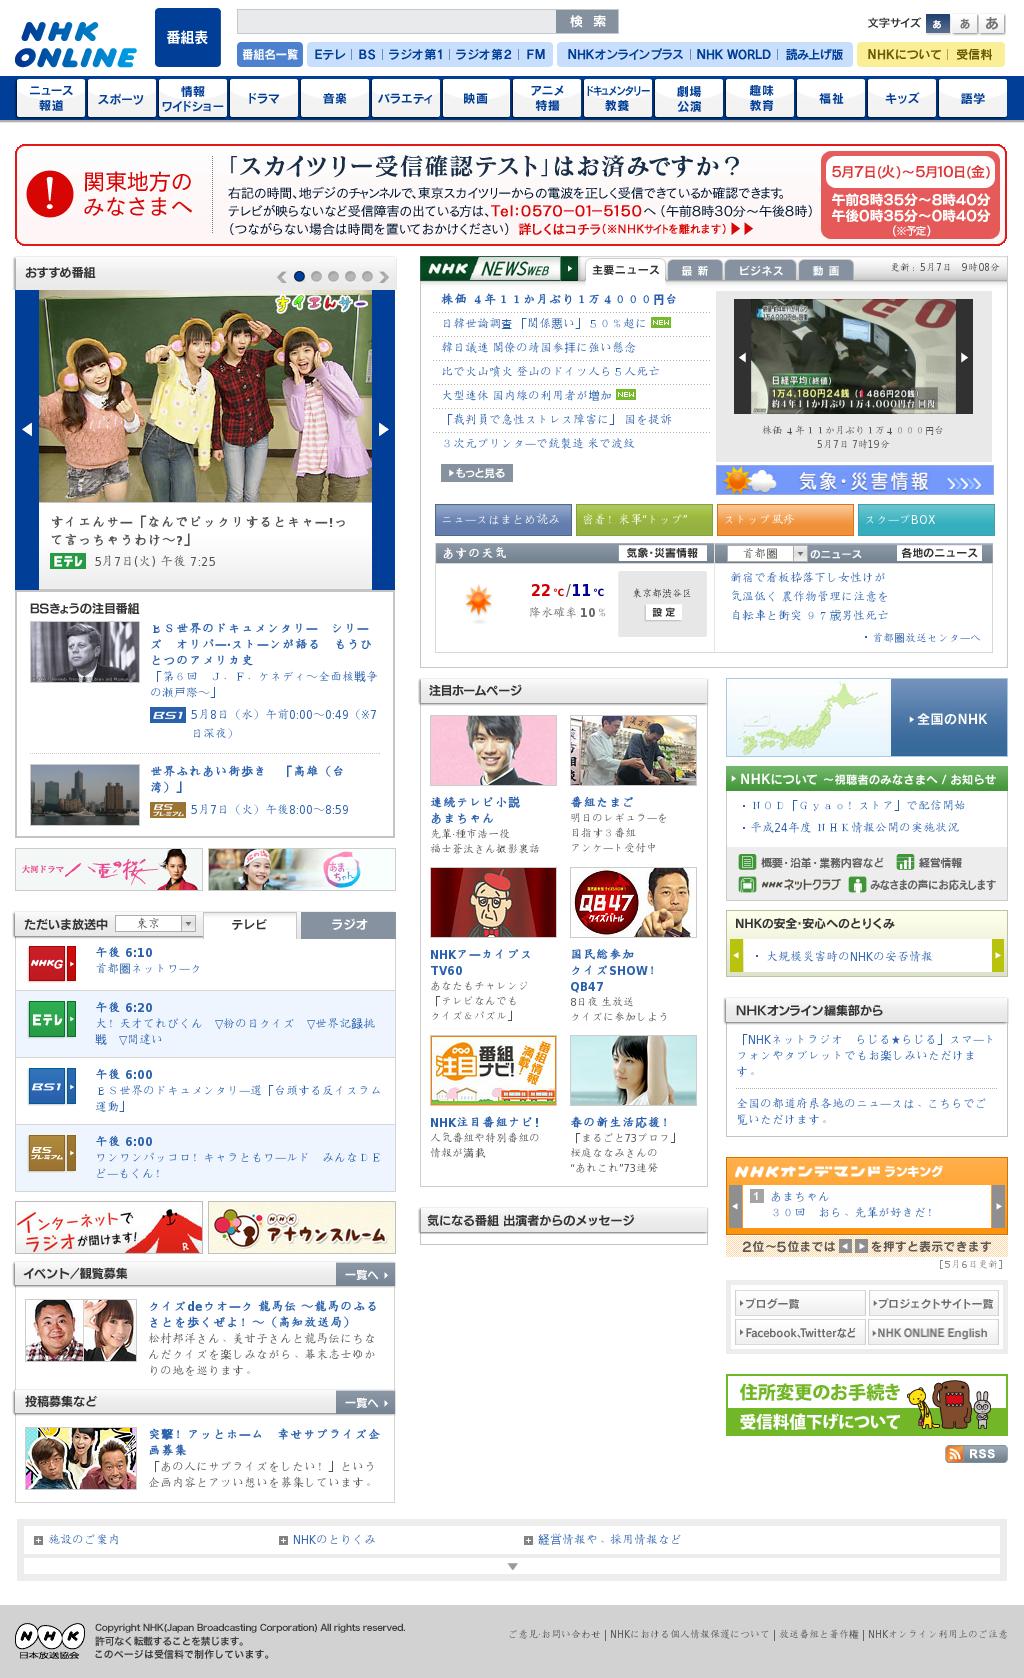 NHK Online at Tuesday May 7, 2013, 9:23 a.m. UTC